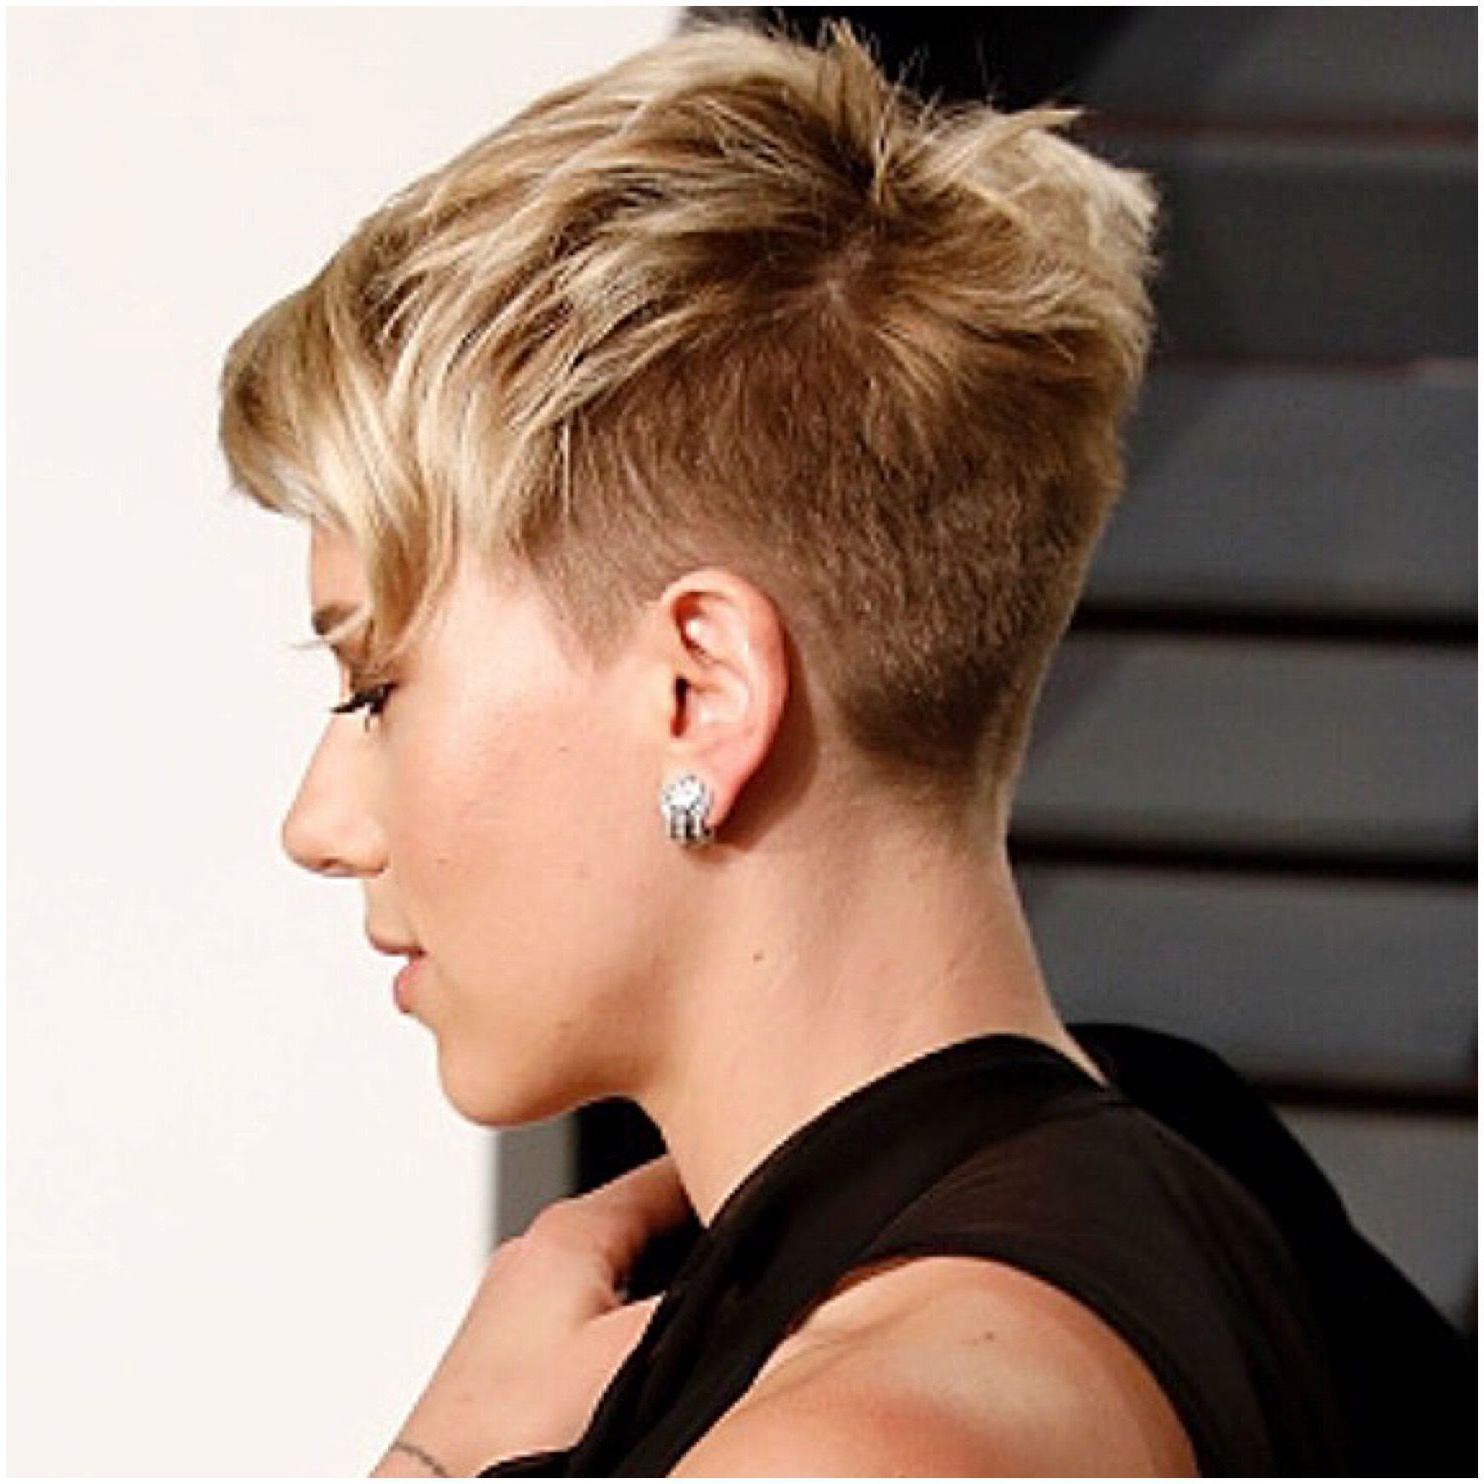 Scarlett Johansson Images Short Hair | Imaganationface Throughout Scarlett Johansson Short Hairstyles (View 15 of 25)